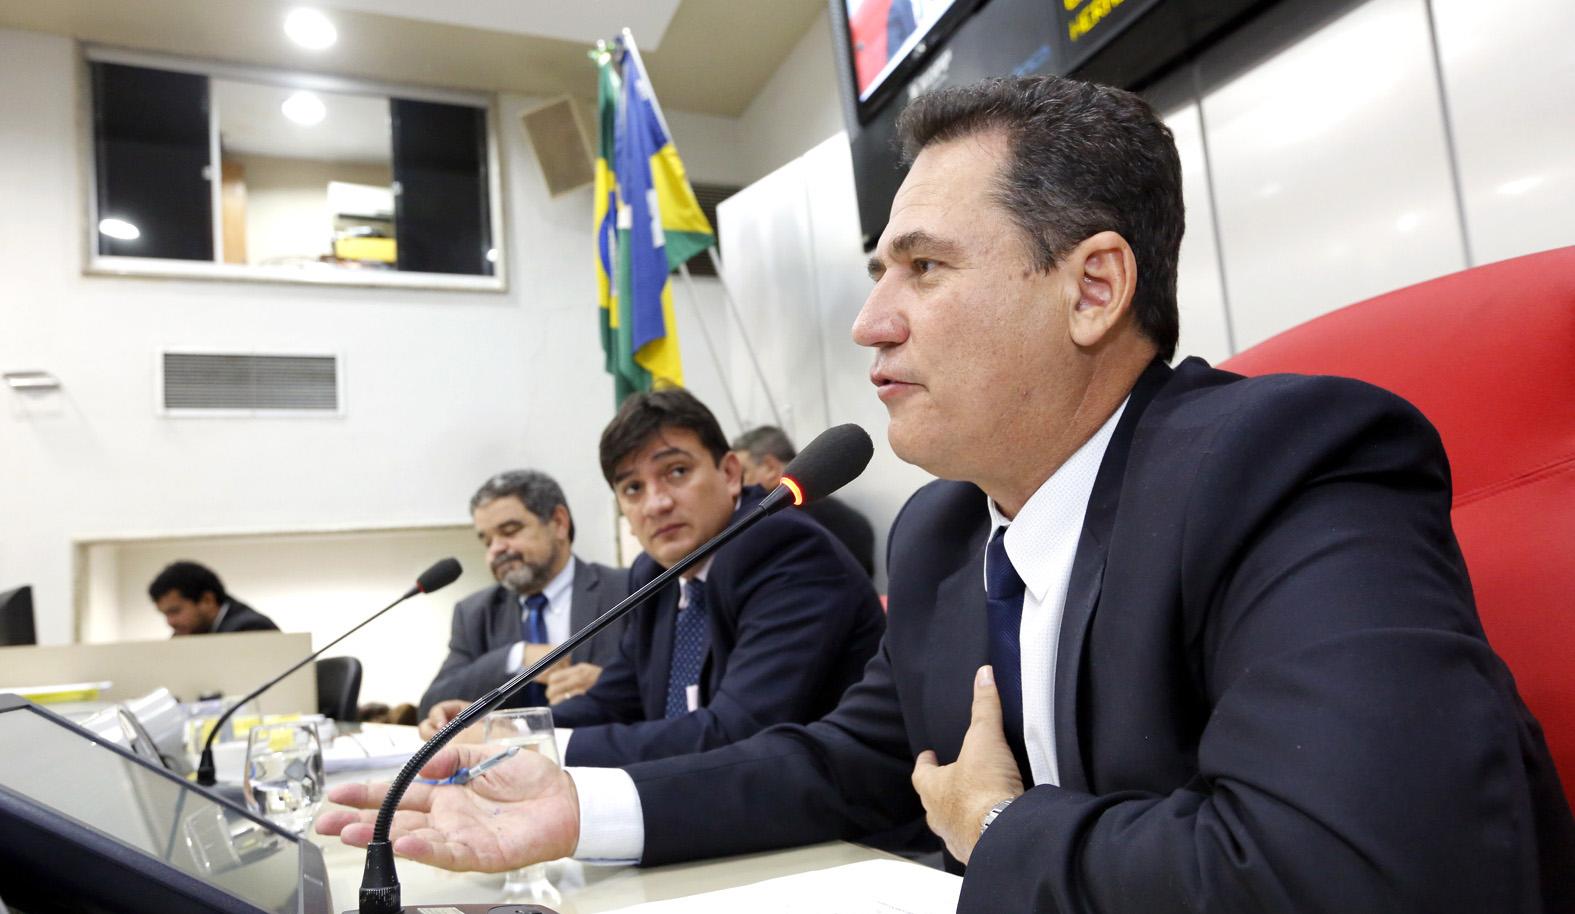 maurao-discutira-regularizacao-fundiaria-em-rondonia-com-presidente-michel-temer.jpg